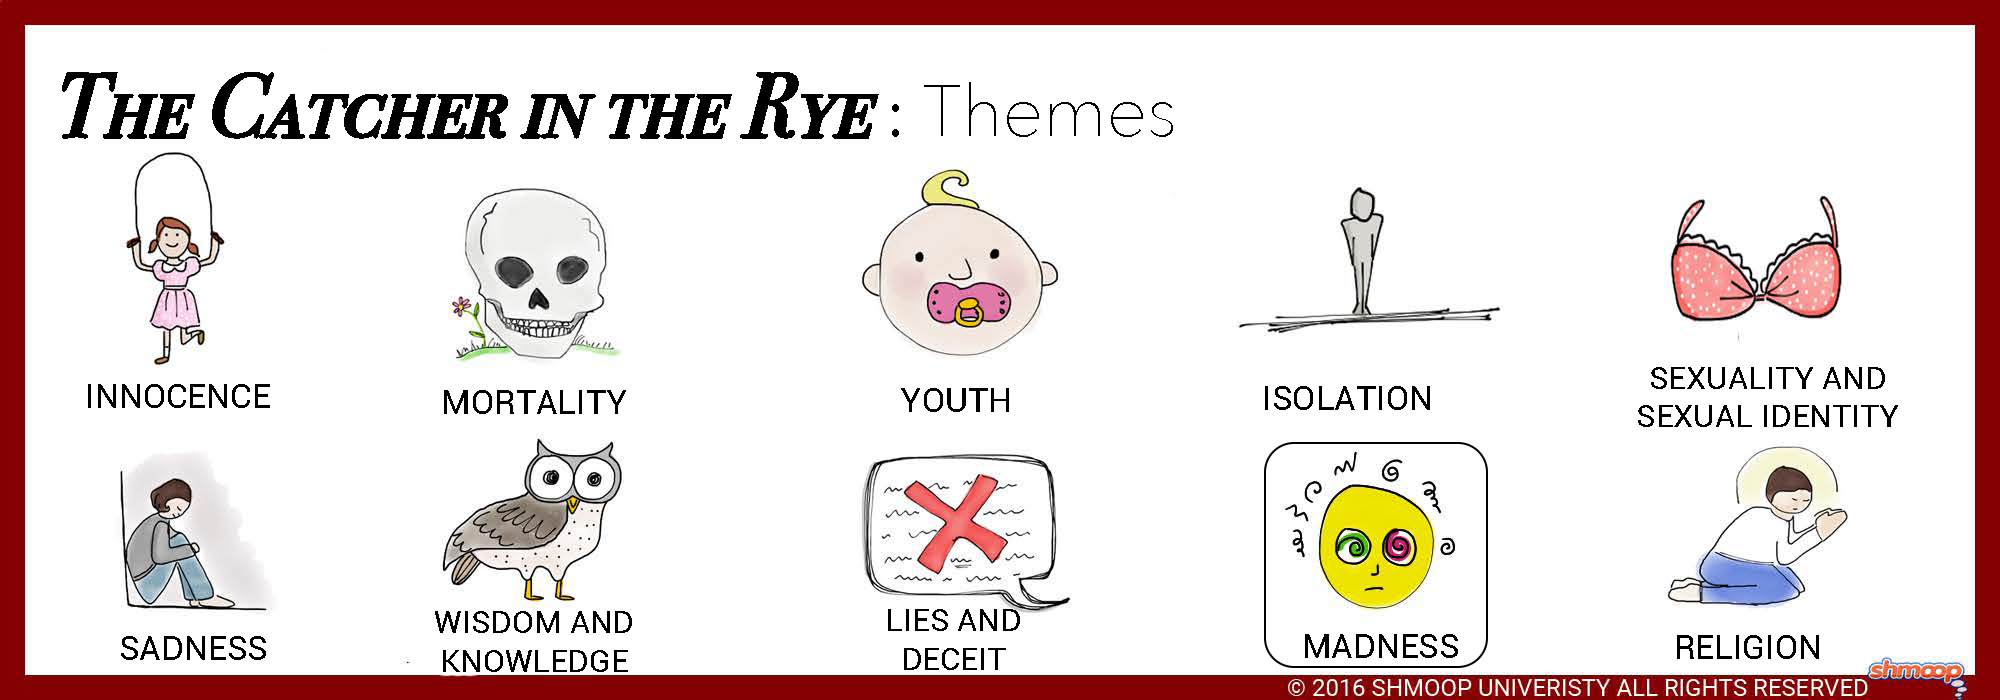 Catcher in the rye theme essay